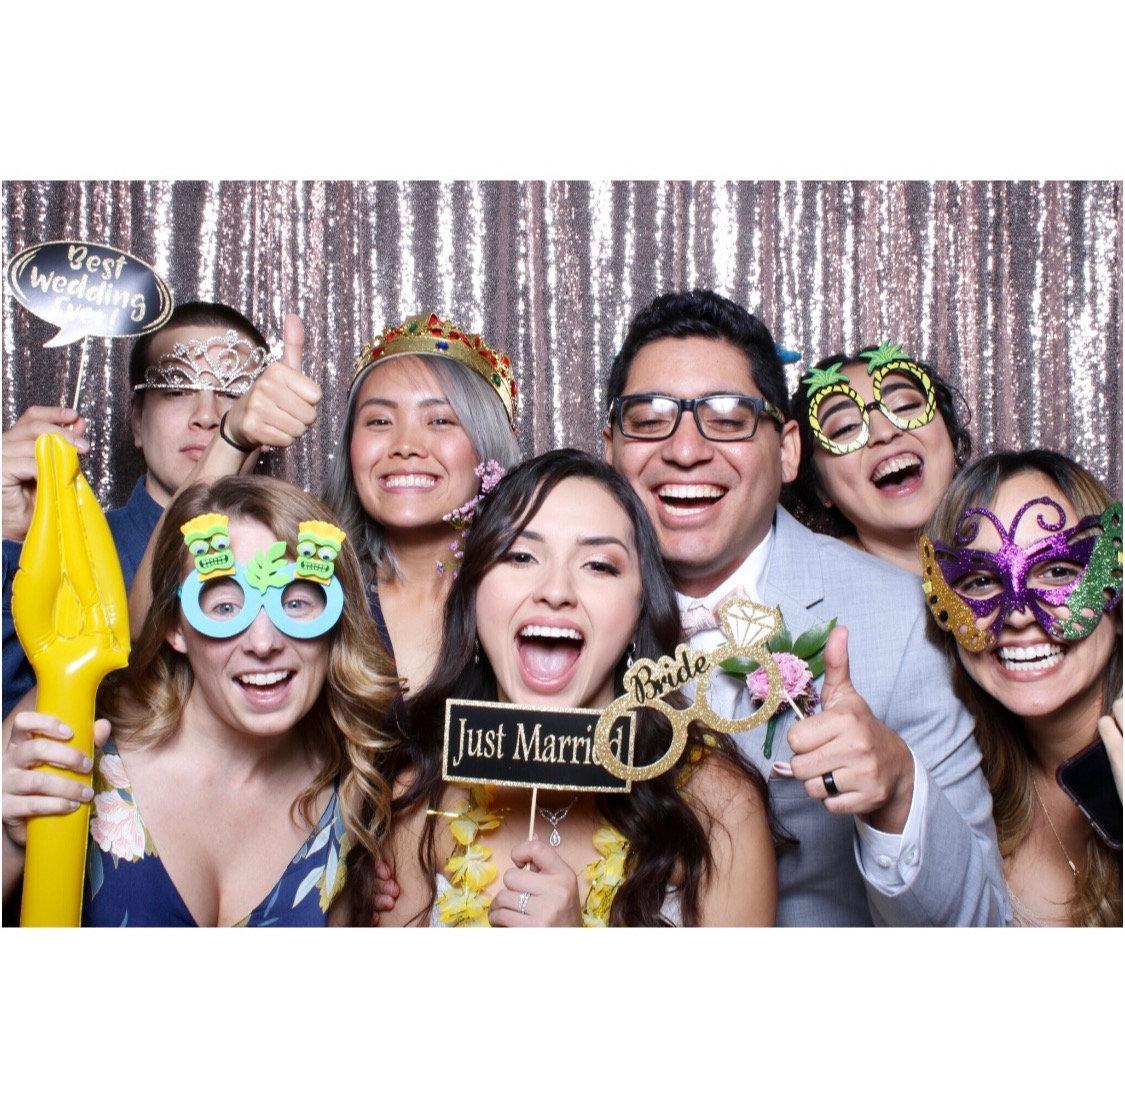 Wedding Reception (Photo Booth)